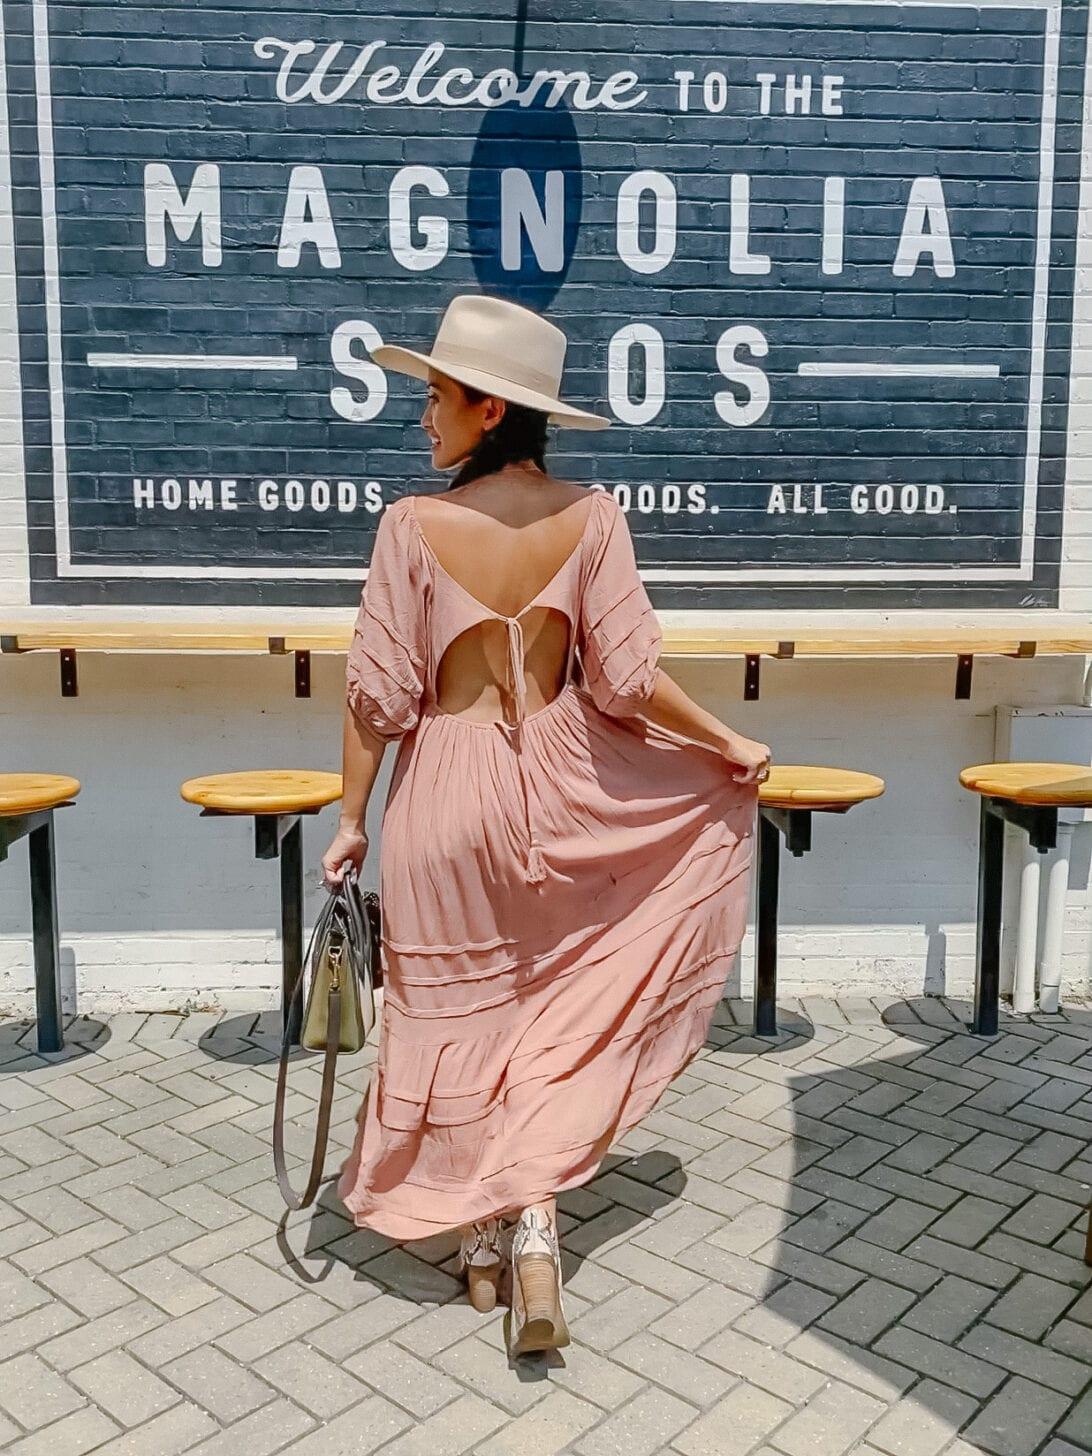 BLUSH DRESS, PINK MAXI DRESS, Joanna Gaines, MAGNOLIA SILOS